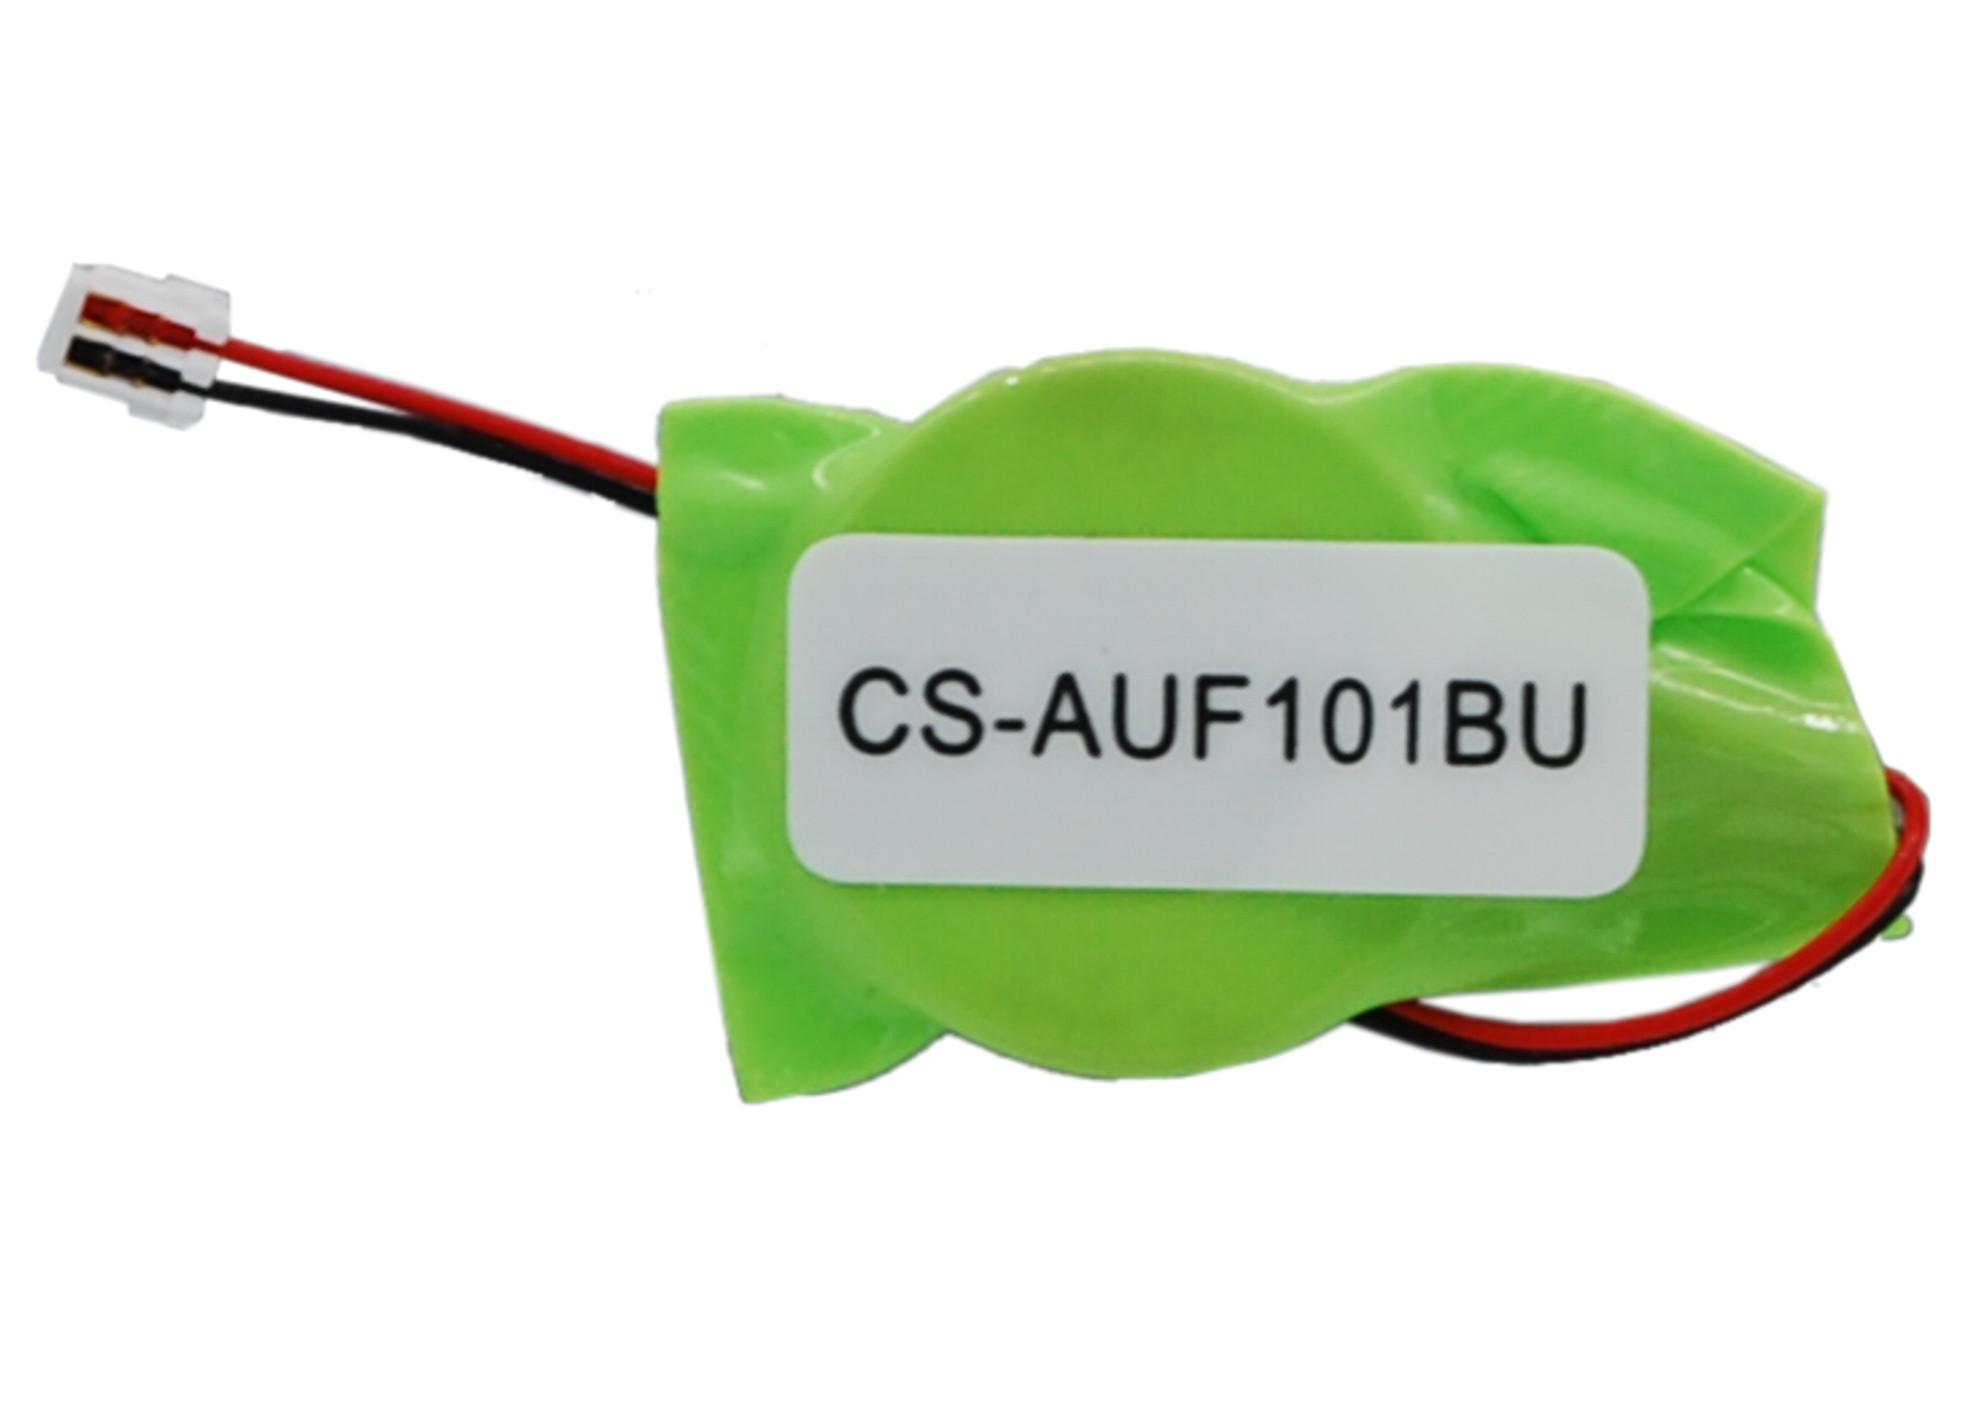 Cameron Sino baterie cmos pro ASUS Eee Pad Transformer TF101-1B050A 3V Li-ion 40mAh zelená - neoriginální